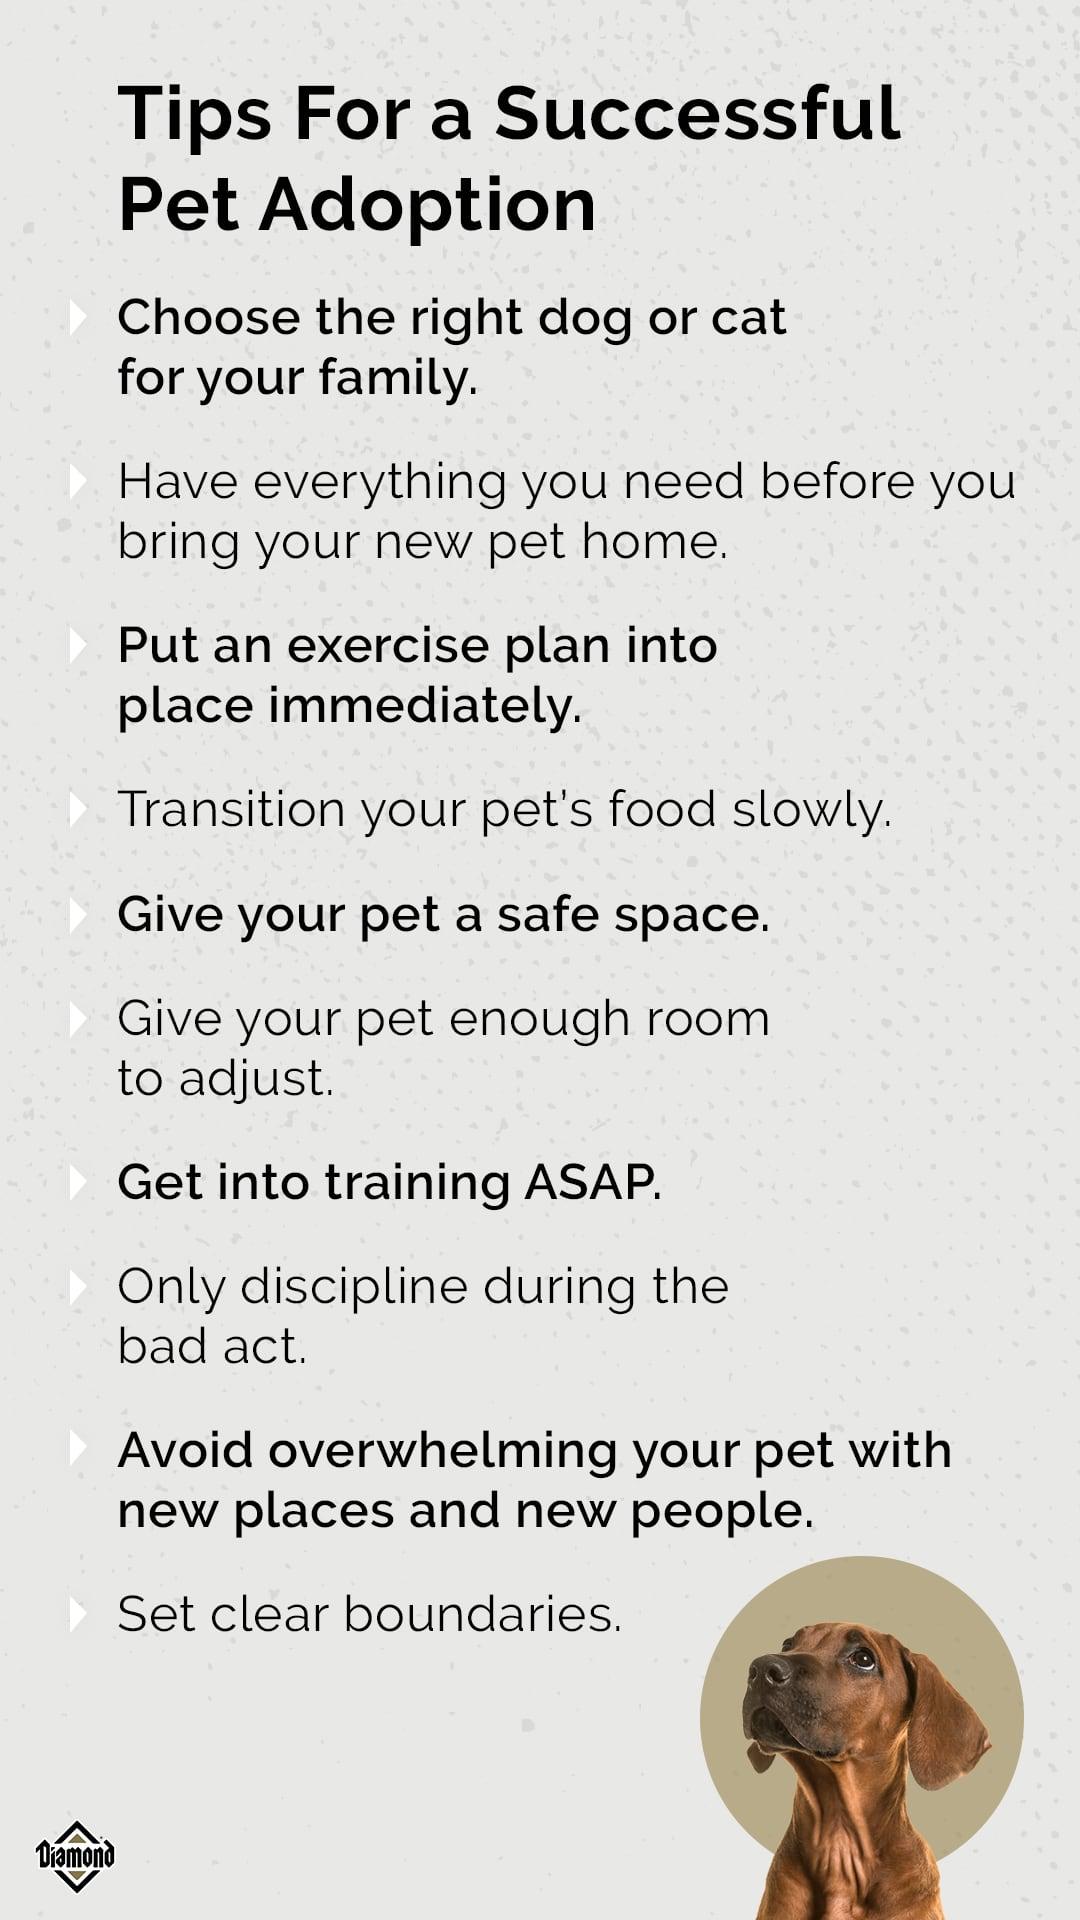 Tips for a Successful Pet Adoption | Diamond Pet Foods